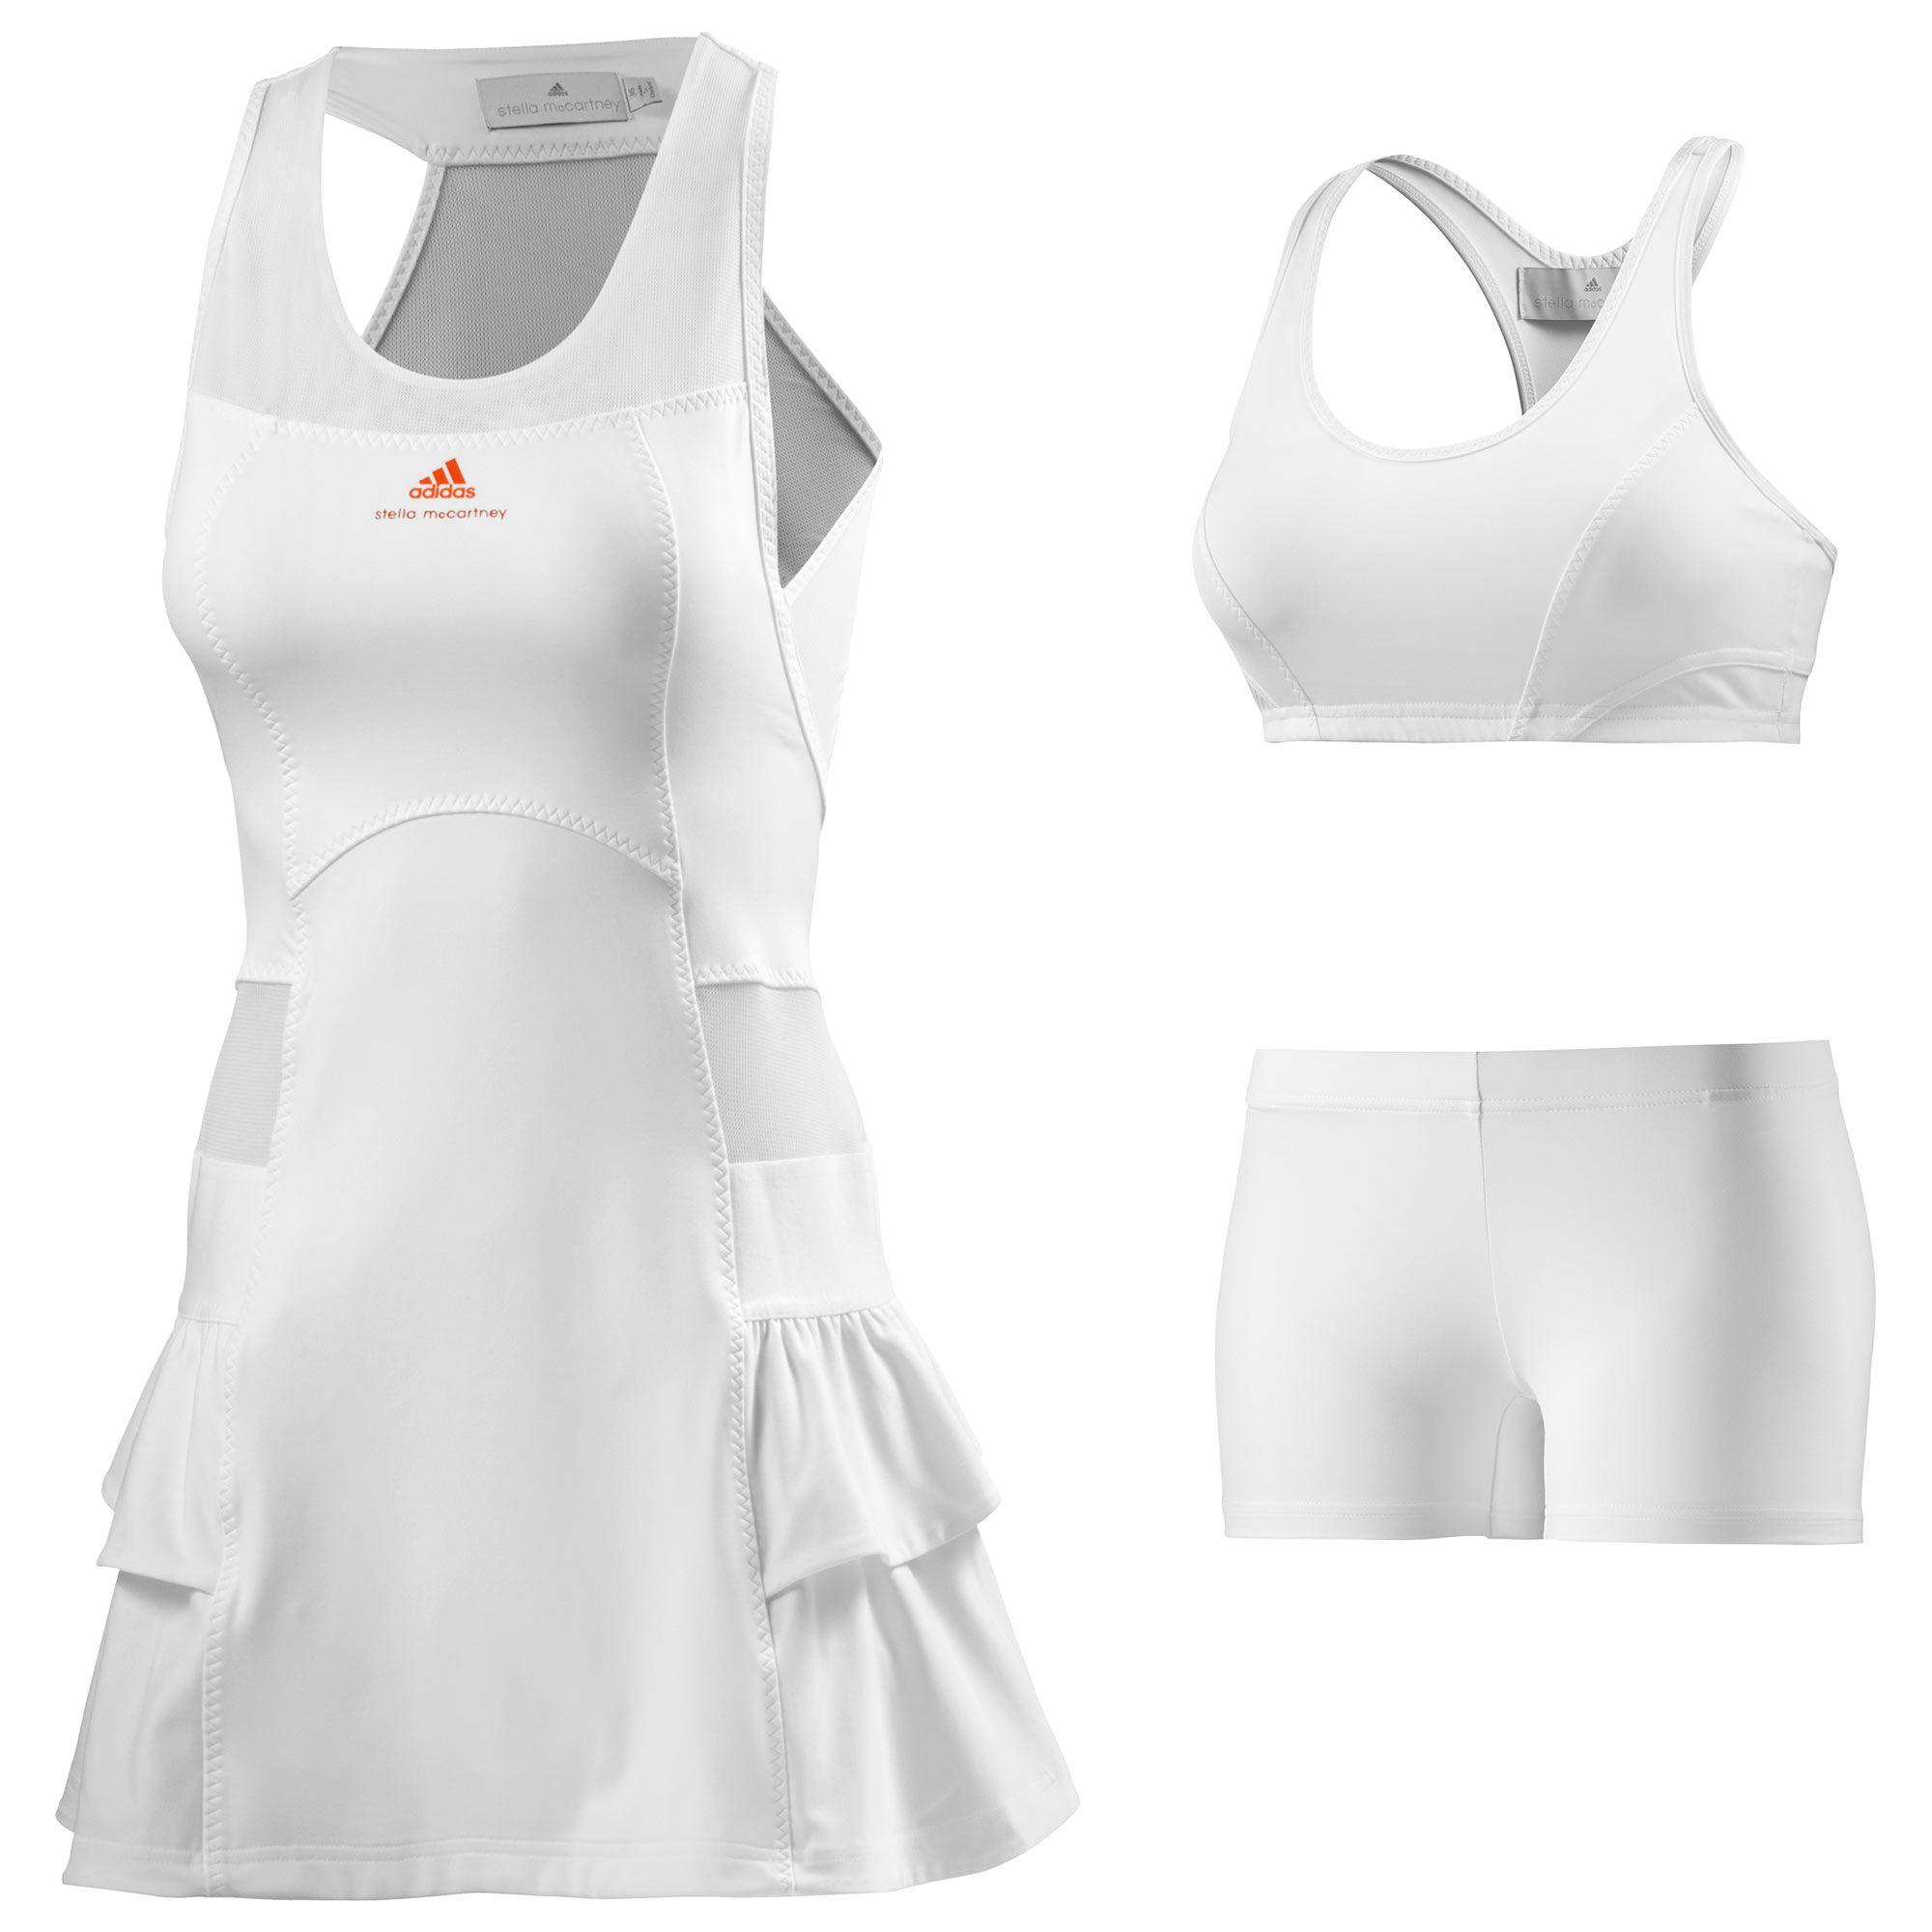 Adidas Official Website Adidas Uk Tennis Clothes Tennis Dress Sport Outfits